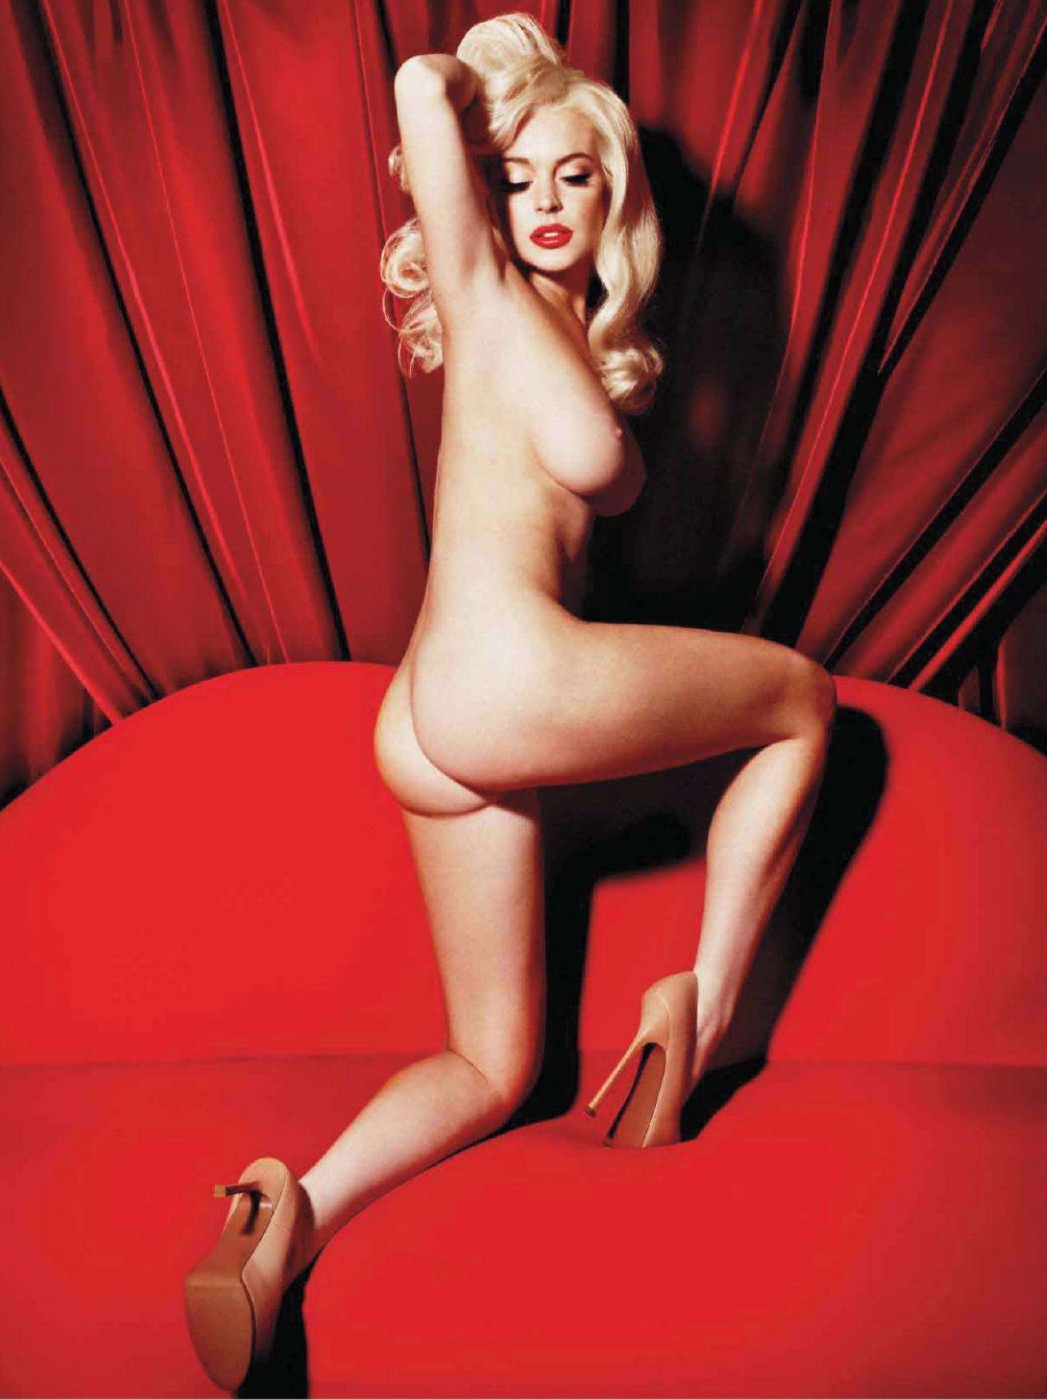 http://1.bp.blogspot.com/--dJPcA5kEug/UEblco0jcoI/AAAAAAAABmE/XiCZBCUT5Ds/s1600/Lindsay_Lohan_LOKY+(29).jpg